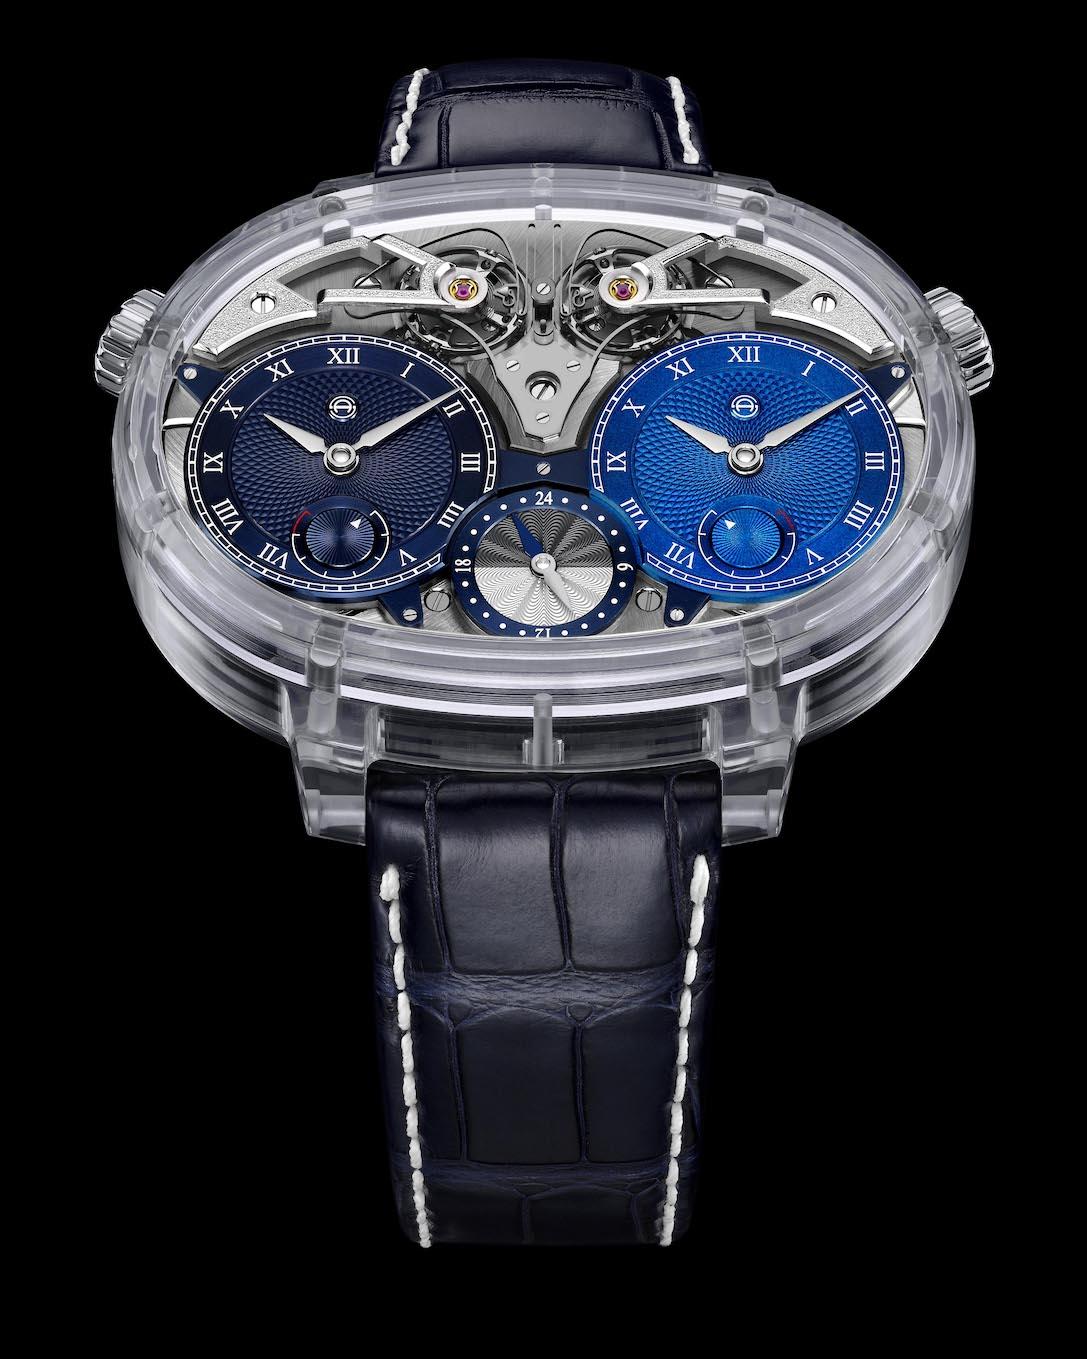 Armin Strom Masterpieces Dual Time Resonance Sapphire Watch, SIHH 2019